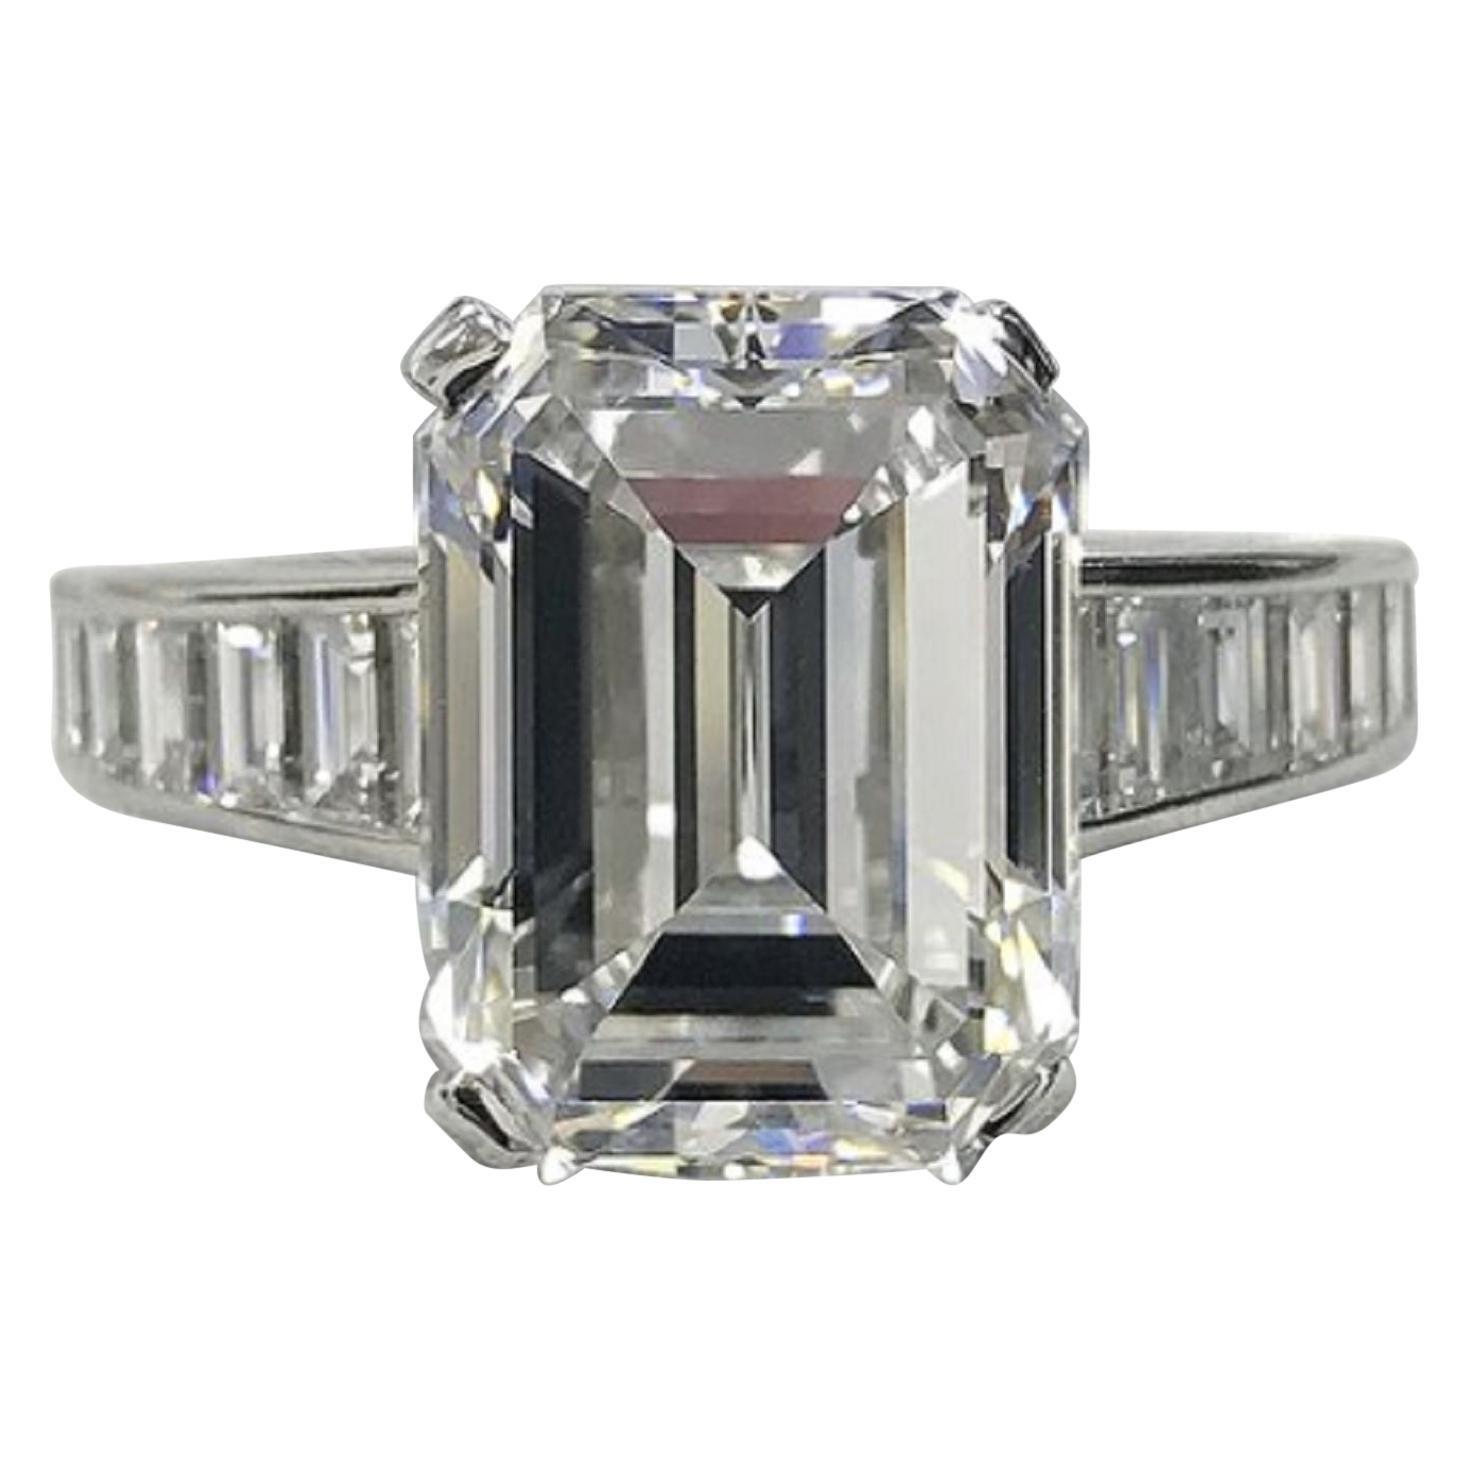 GIA Certified 4 Carat Emerald Cut Diamond Ring